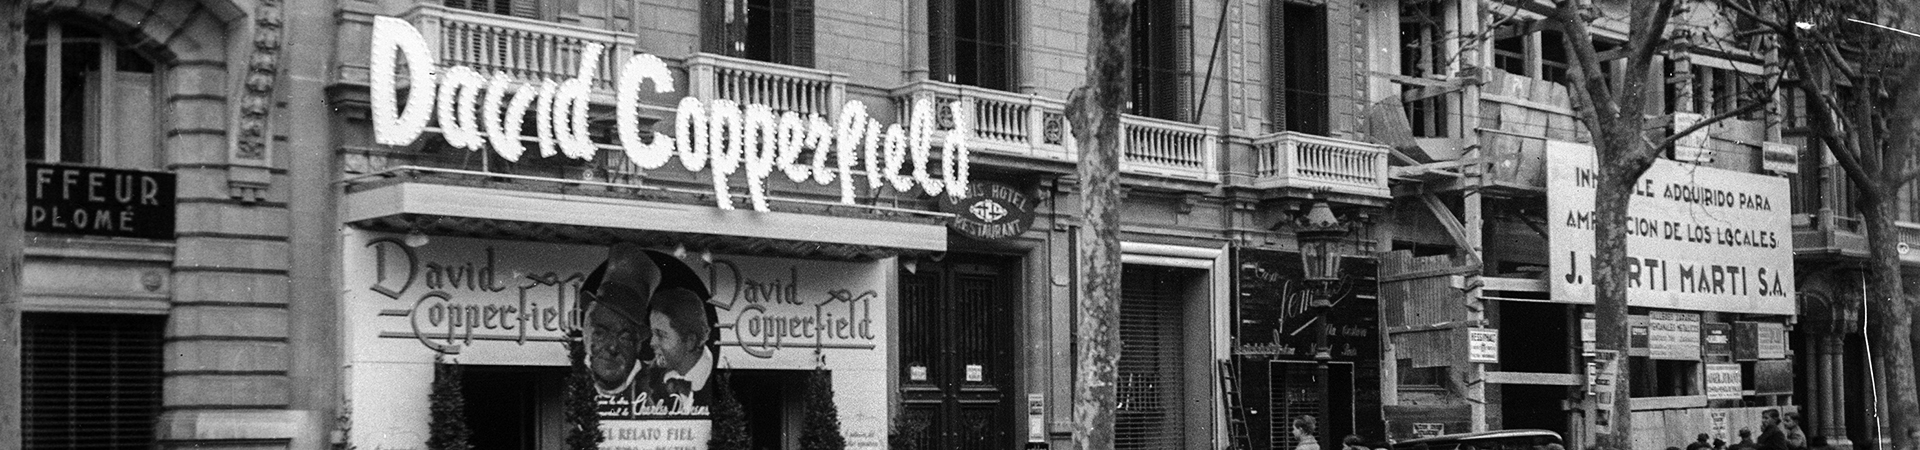 Col·lecció Merletti / IEFC